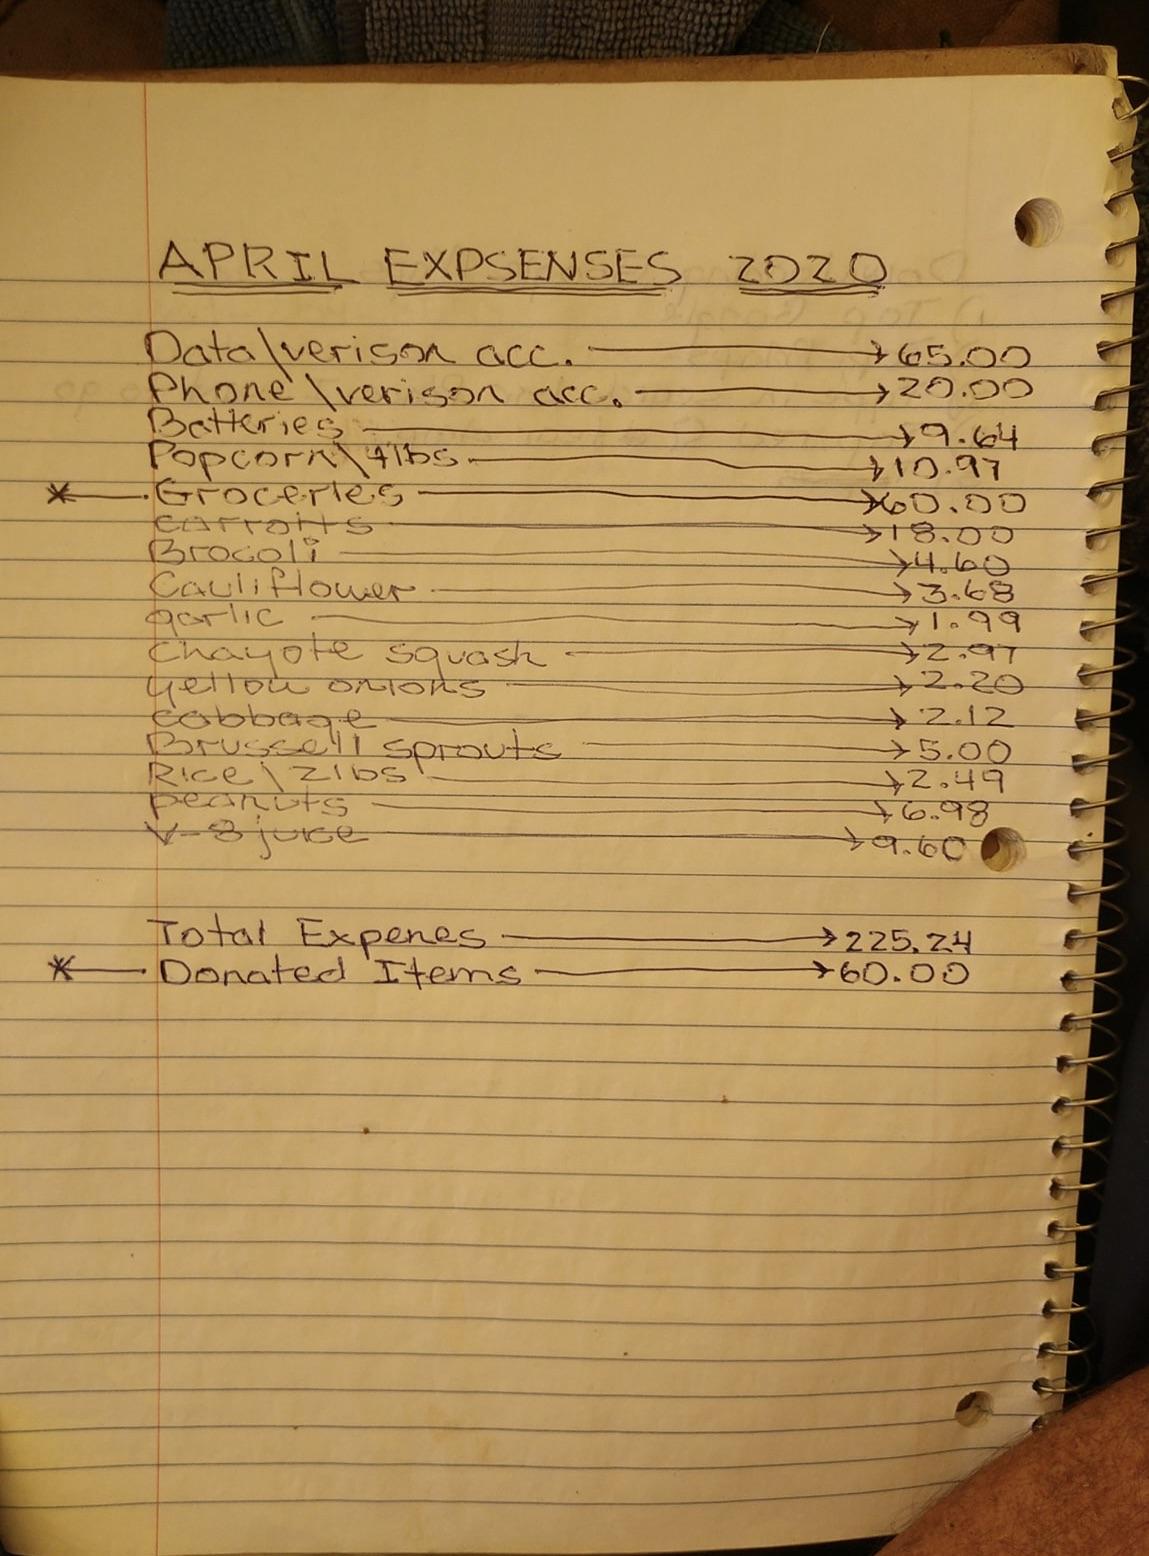 April 2020 Expenses $225.24